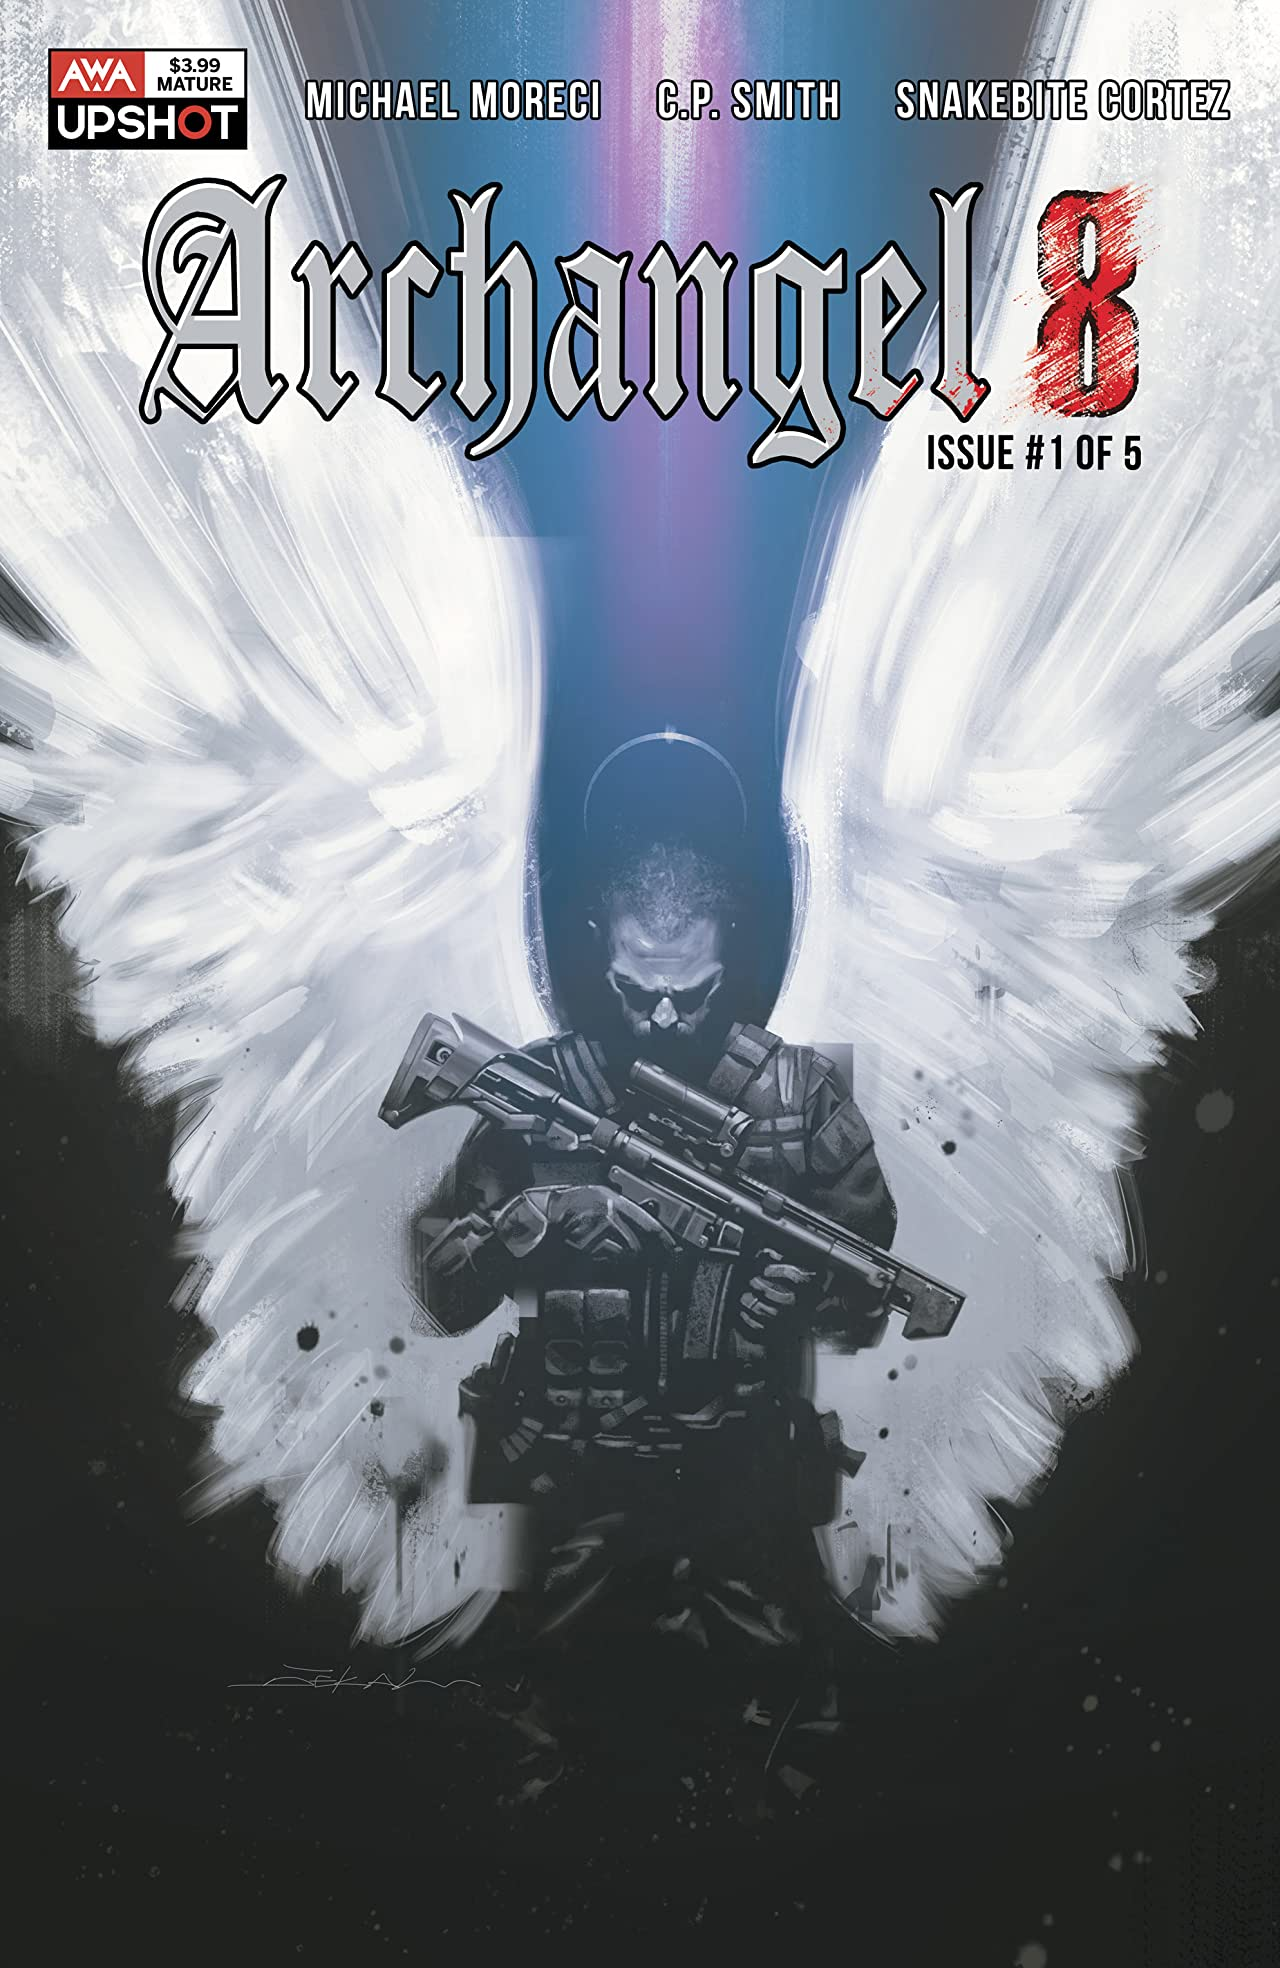 Archangel 8 #1 (of 5)